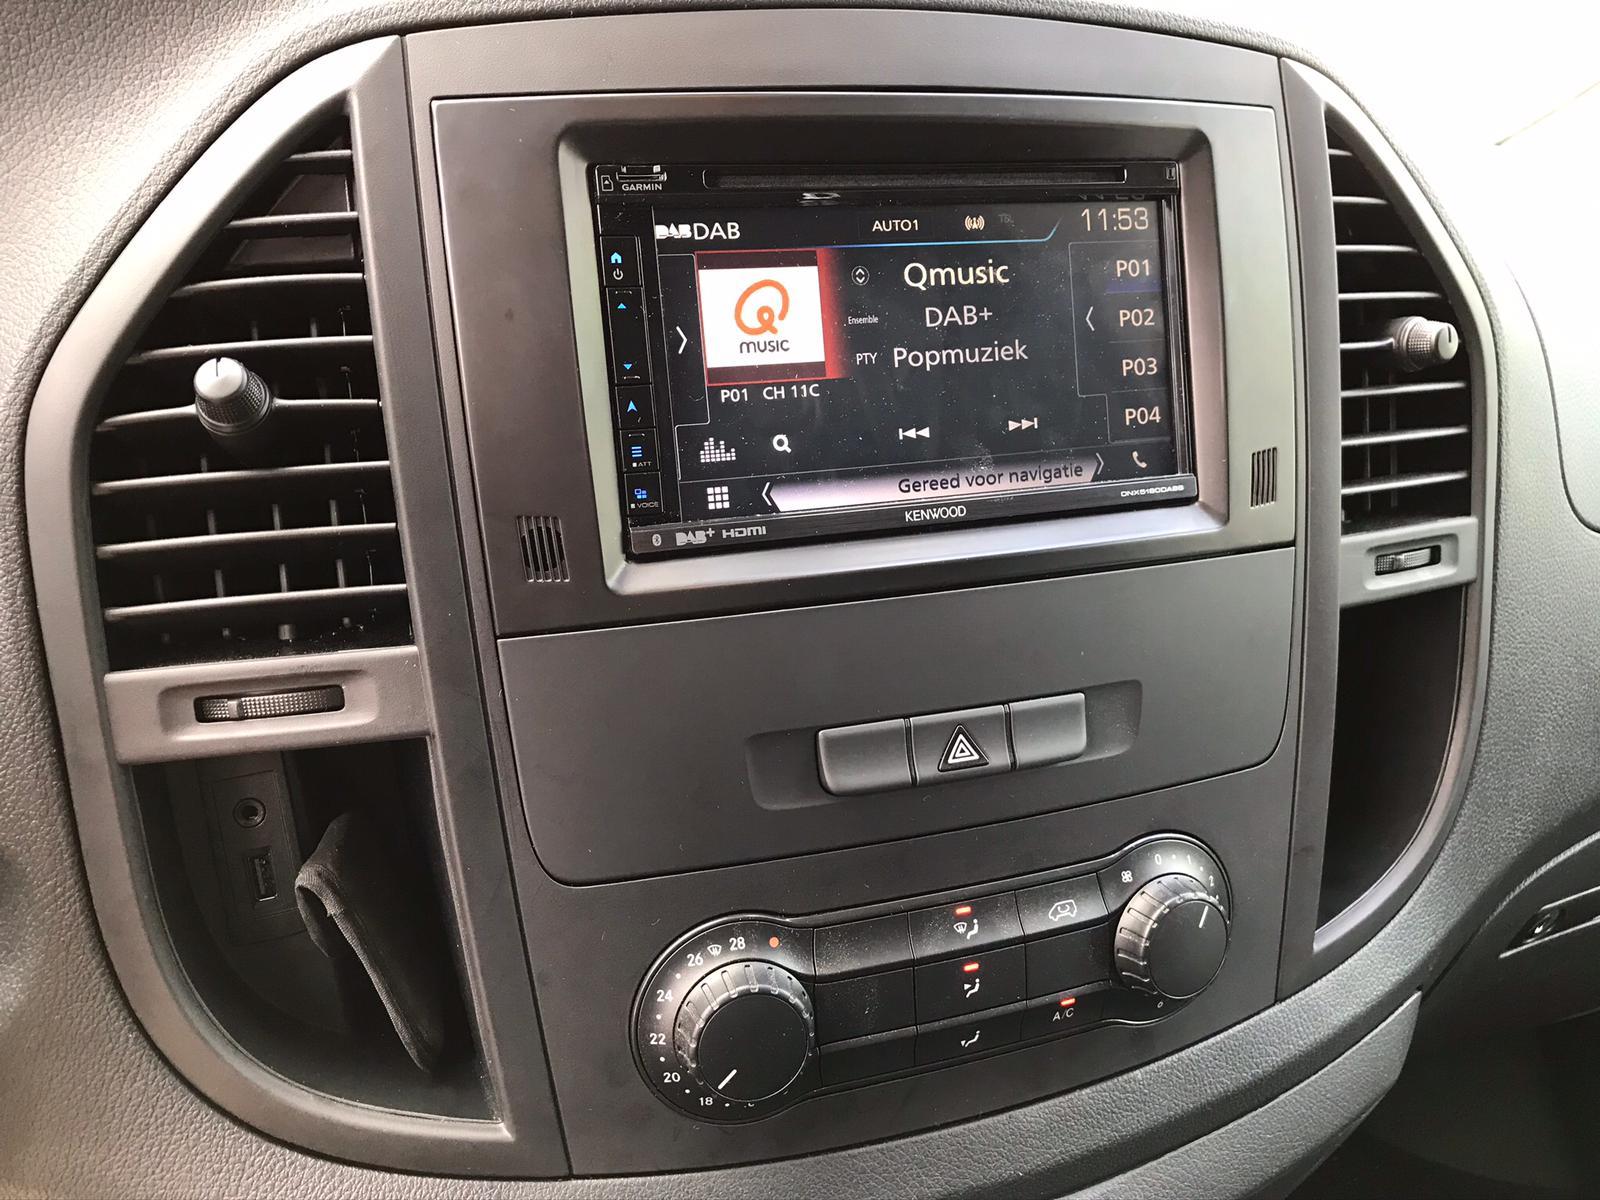 Mercedes Vito - Multimedia system + Apple Carplay + Achteruitrijcamera